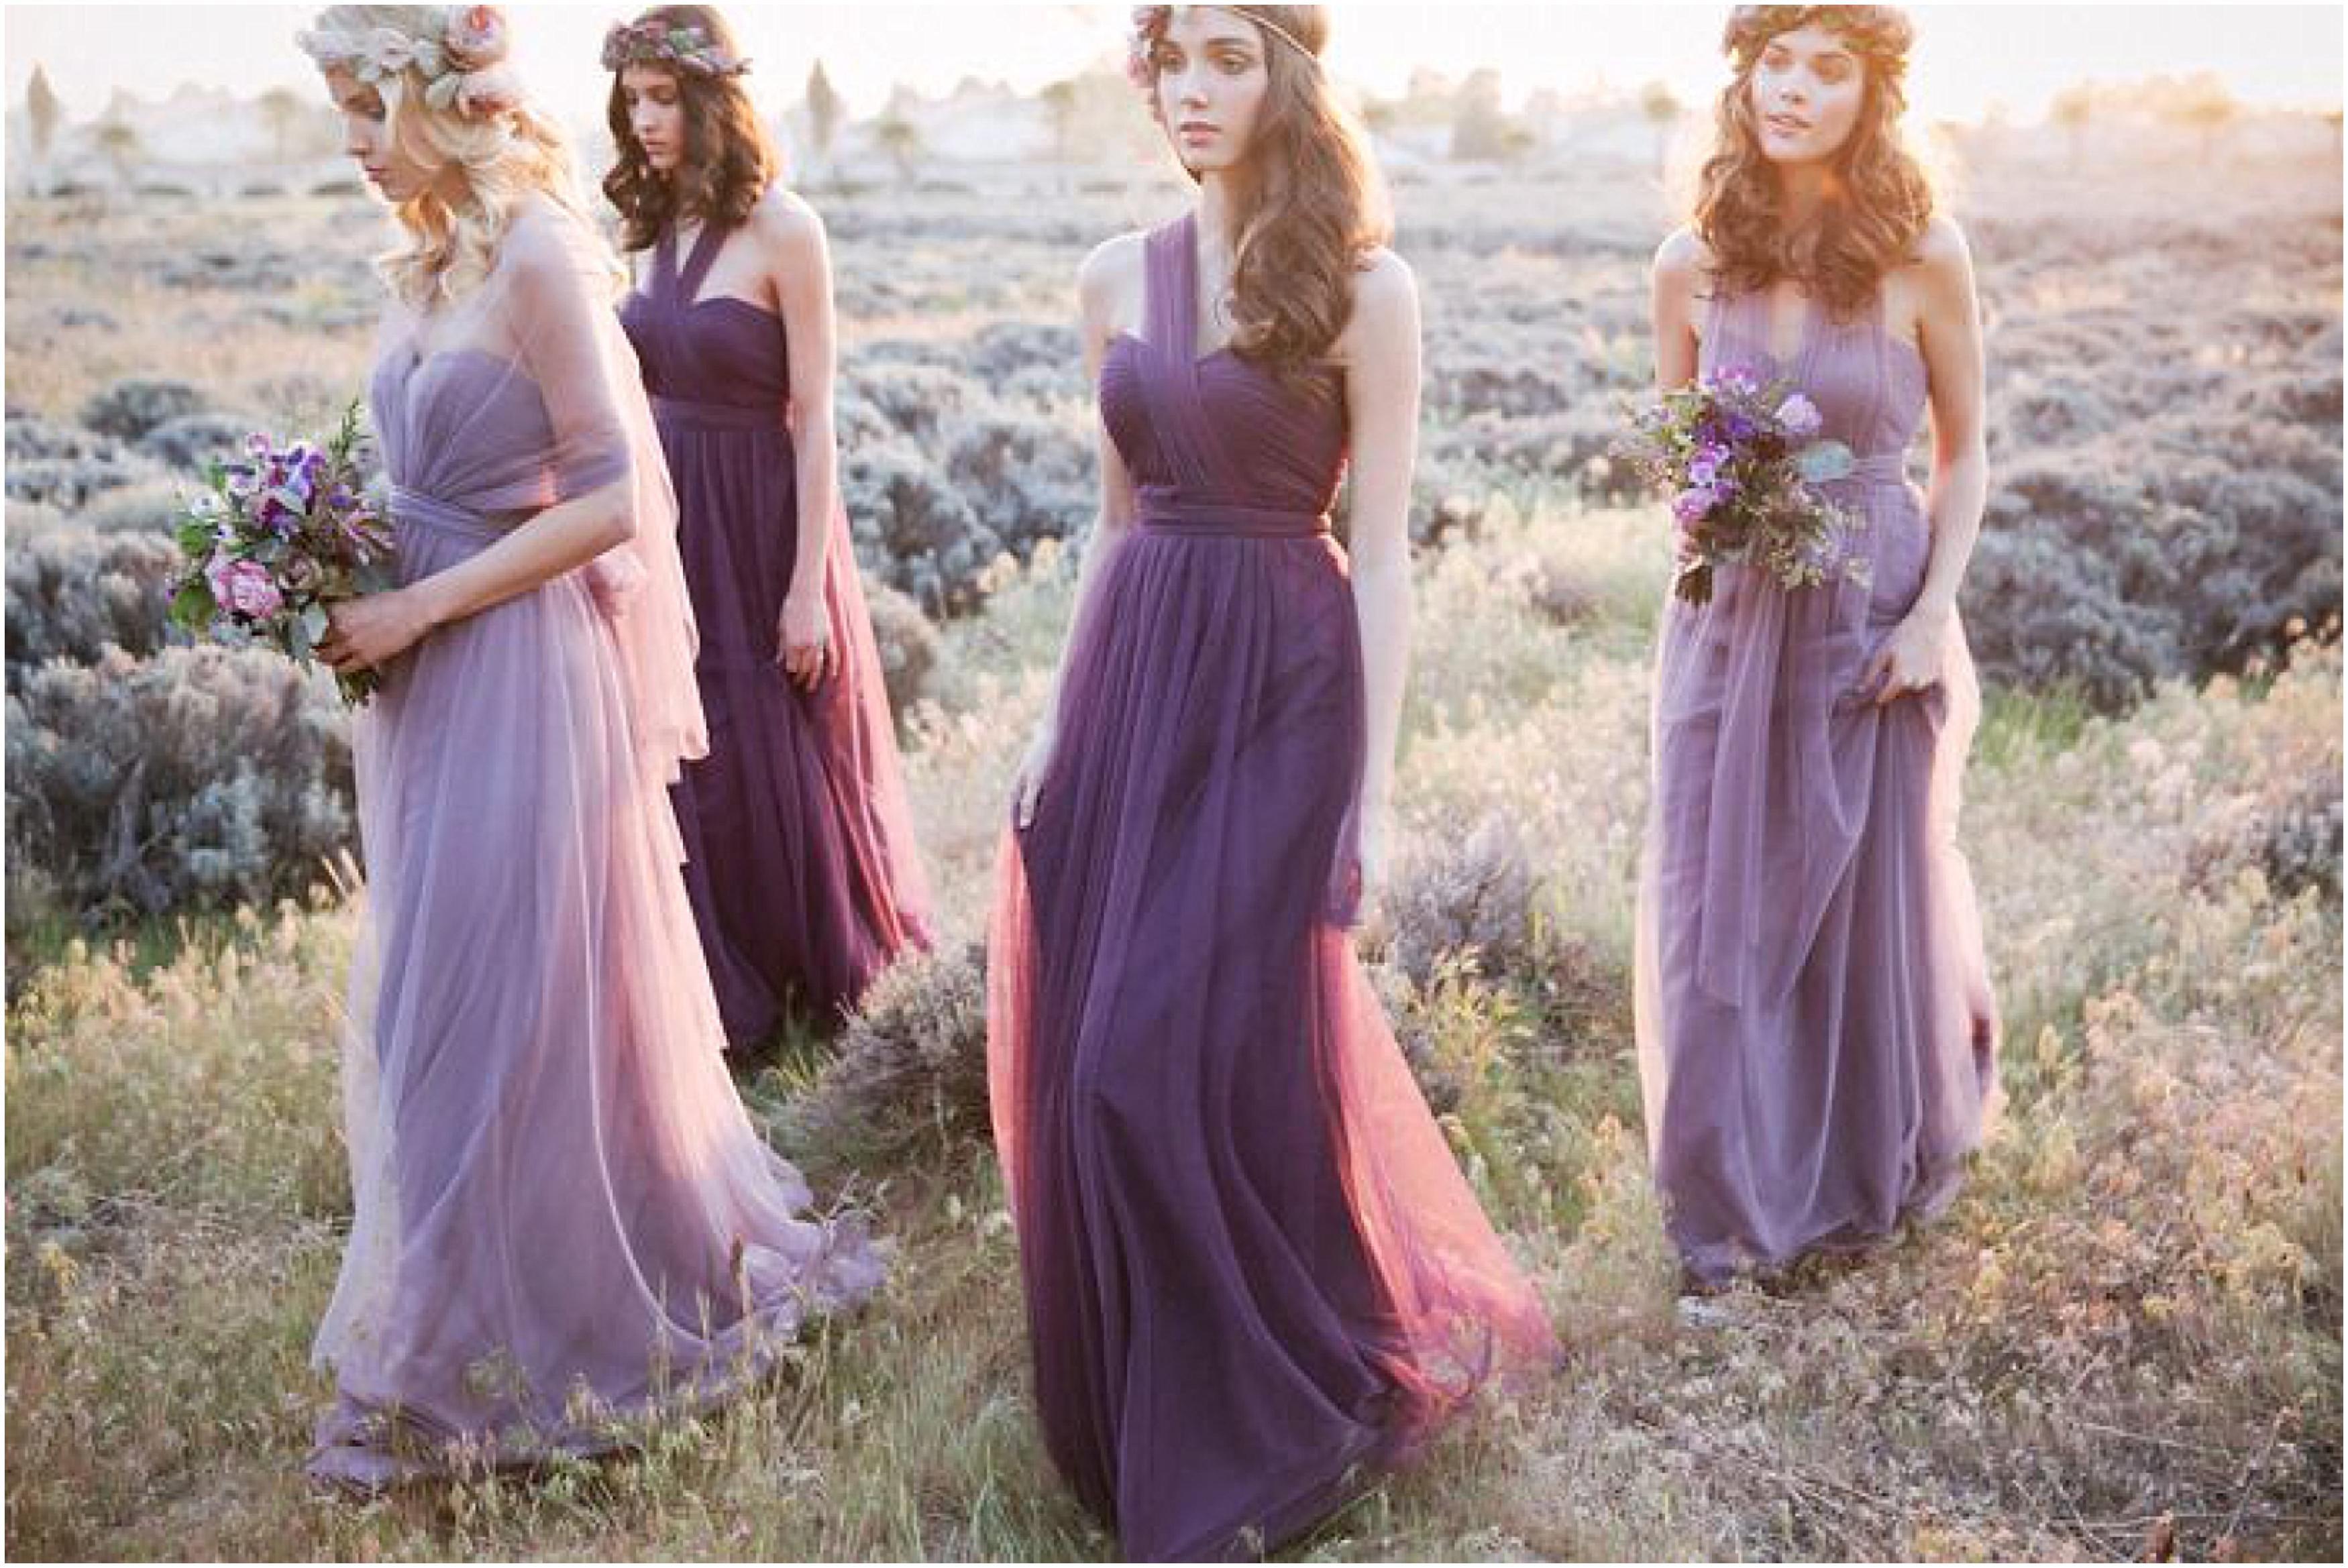 Mismatched Convertible Bridesmaid Dresses | Bridesmaid inspiration ...